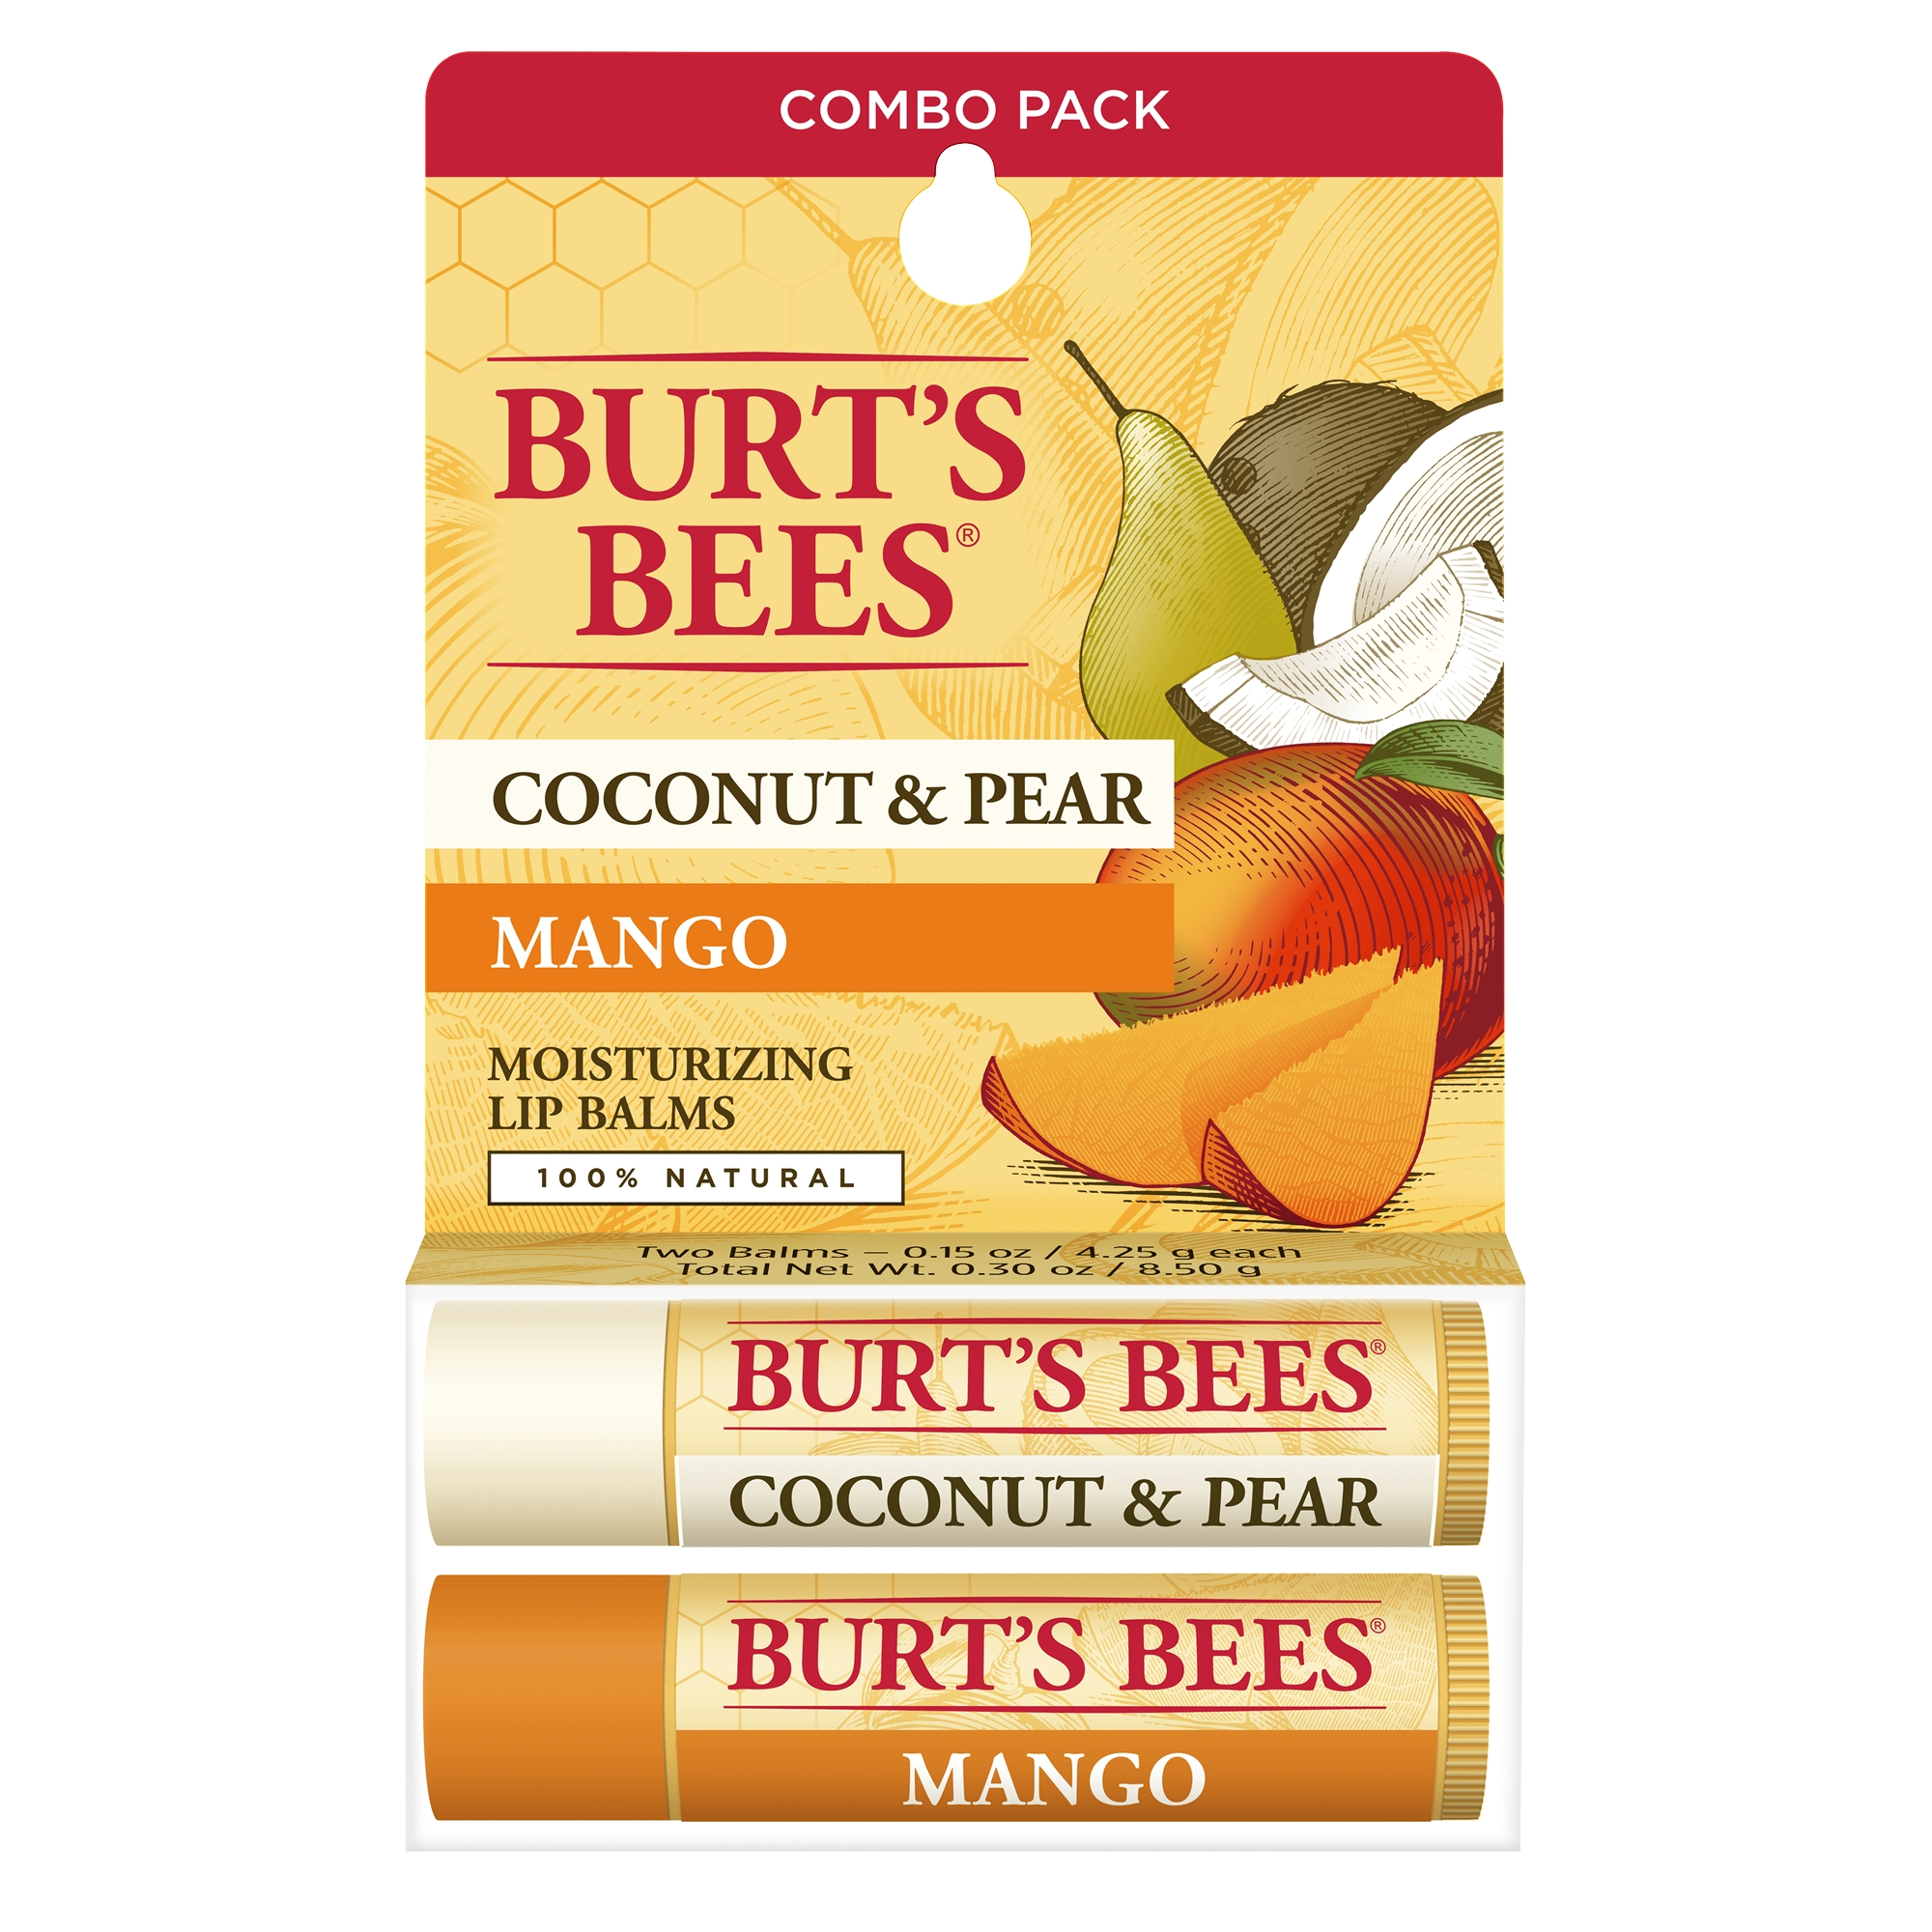 Burt's Bees 100% Natural Moisturizing Lip Balm, Coconut & Pear and Mango, 2 Tubes in Blister Box